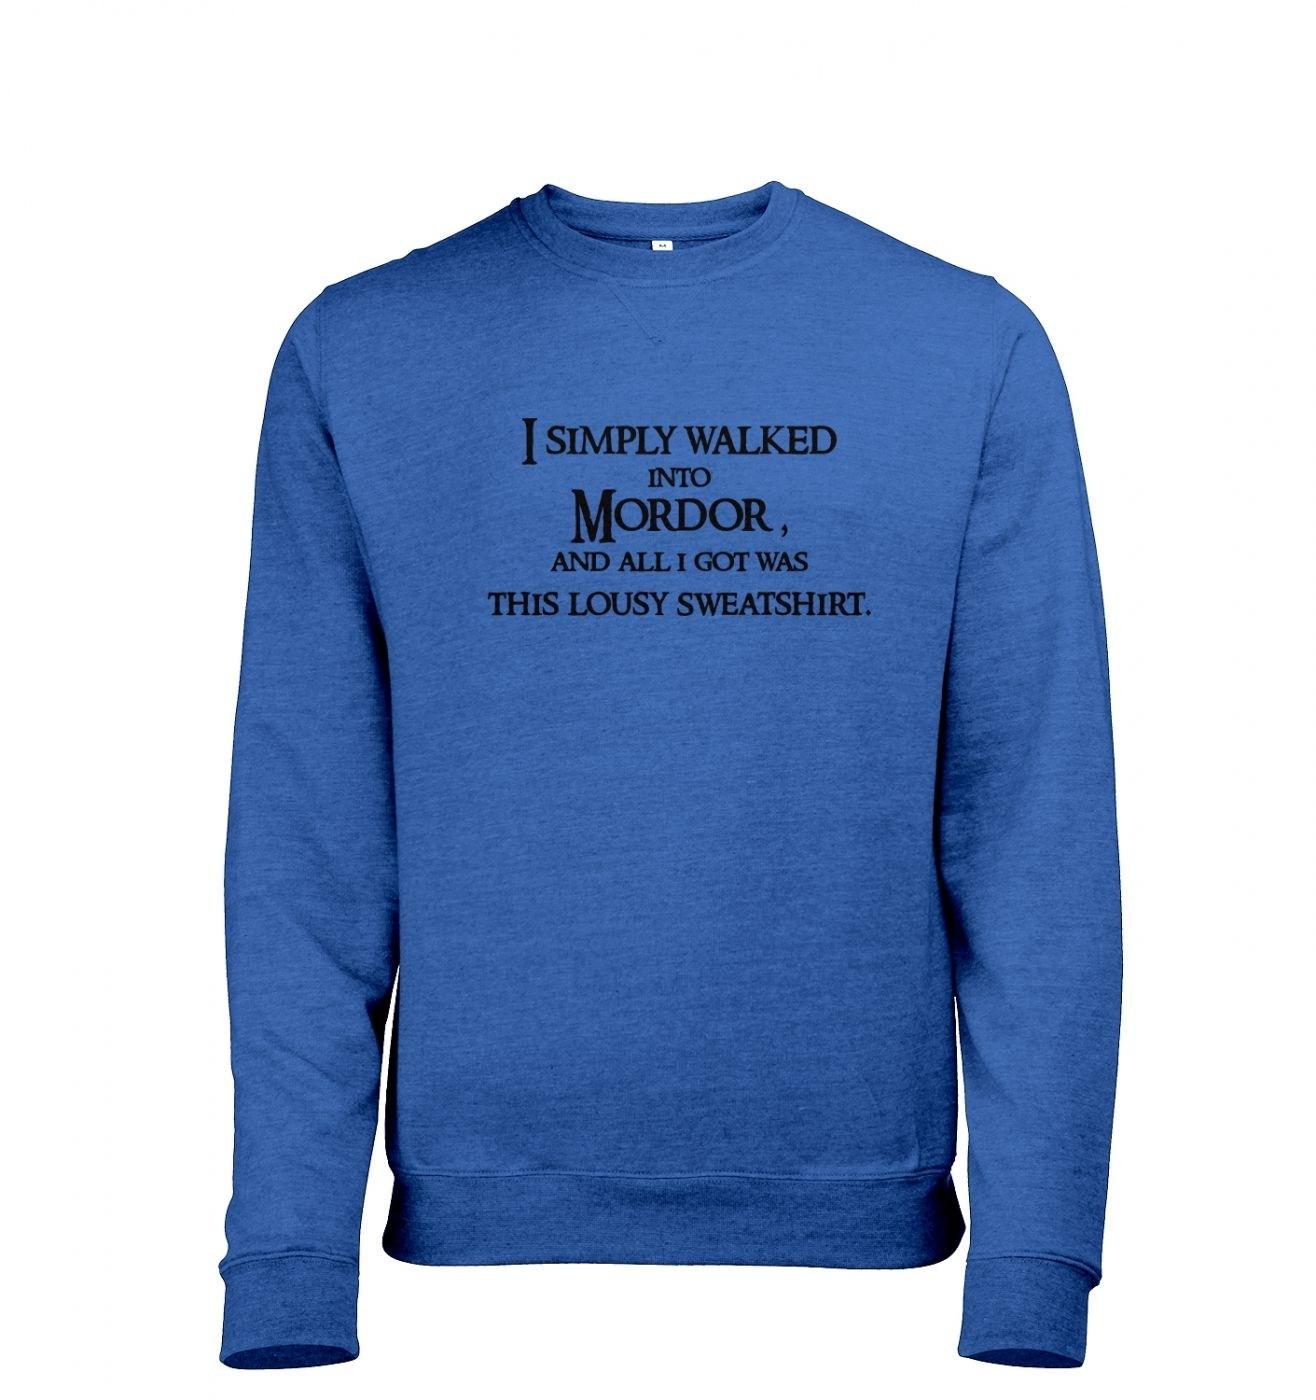 A Sweatshirt From Mordor t-shirt